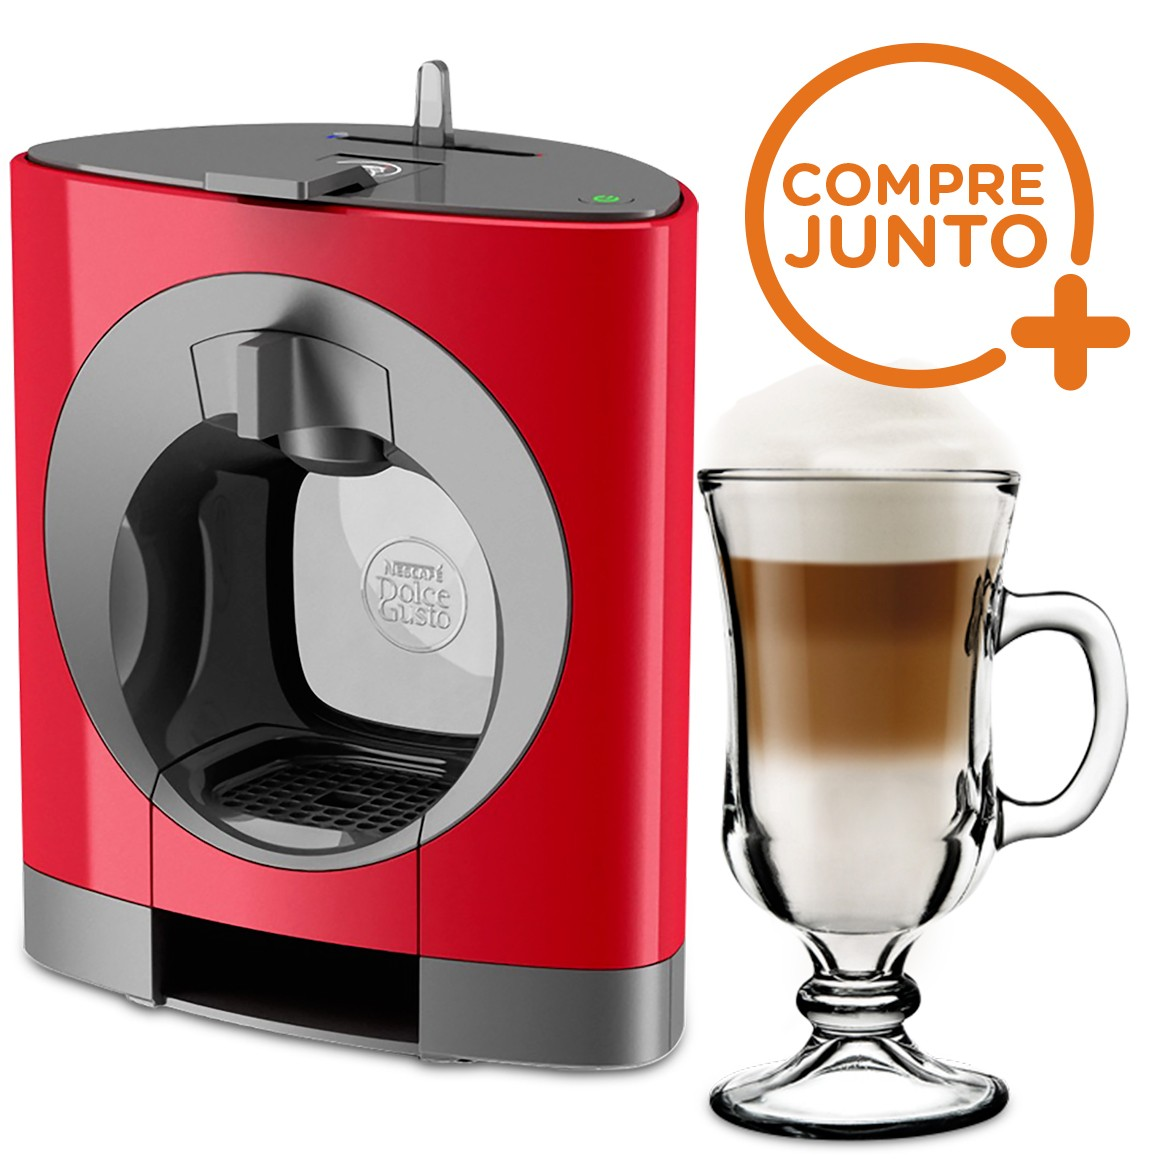 Cafeteira Expresso Dolce Gusto Oblo Vermelha 110v + 1 Taça Nevada Irish Coffee 130ml